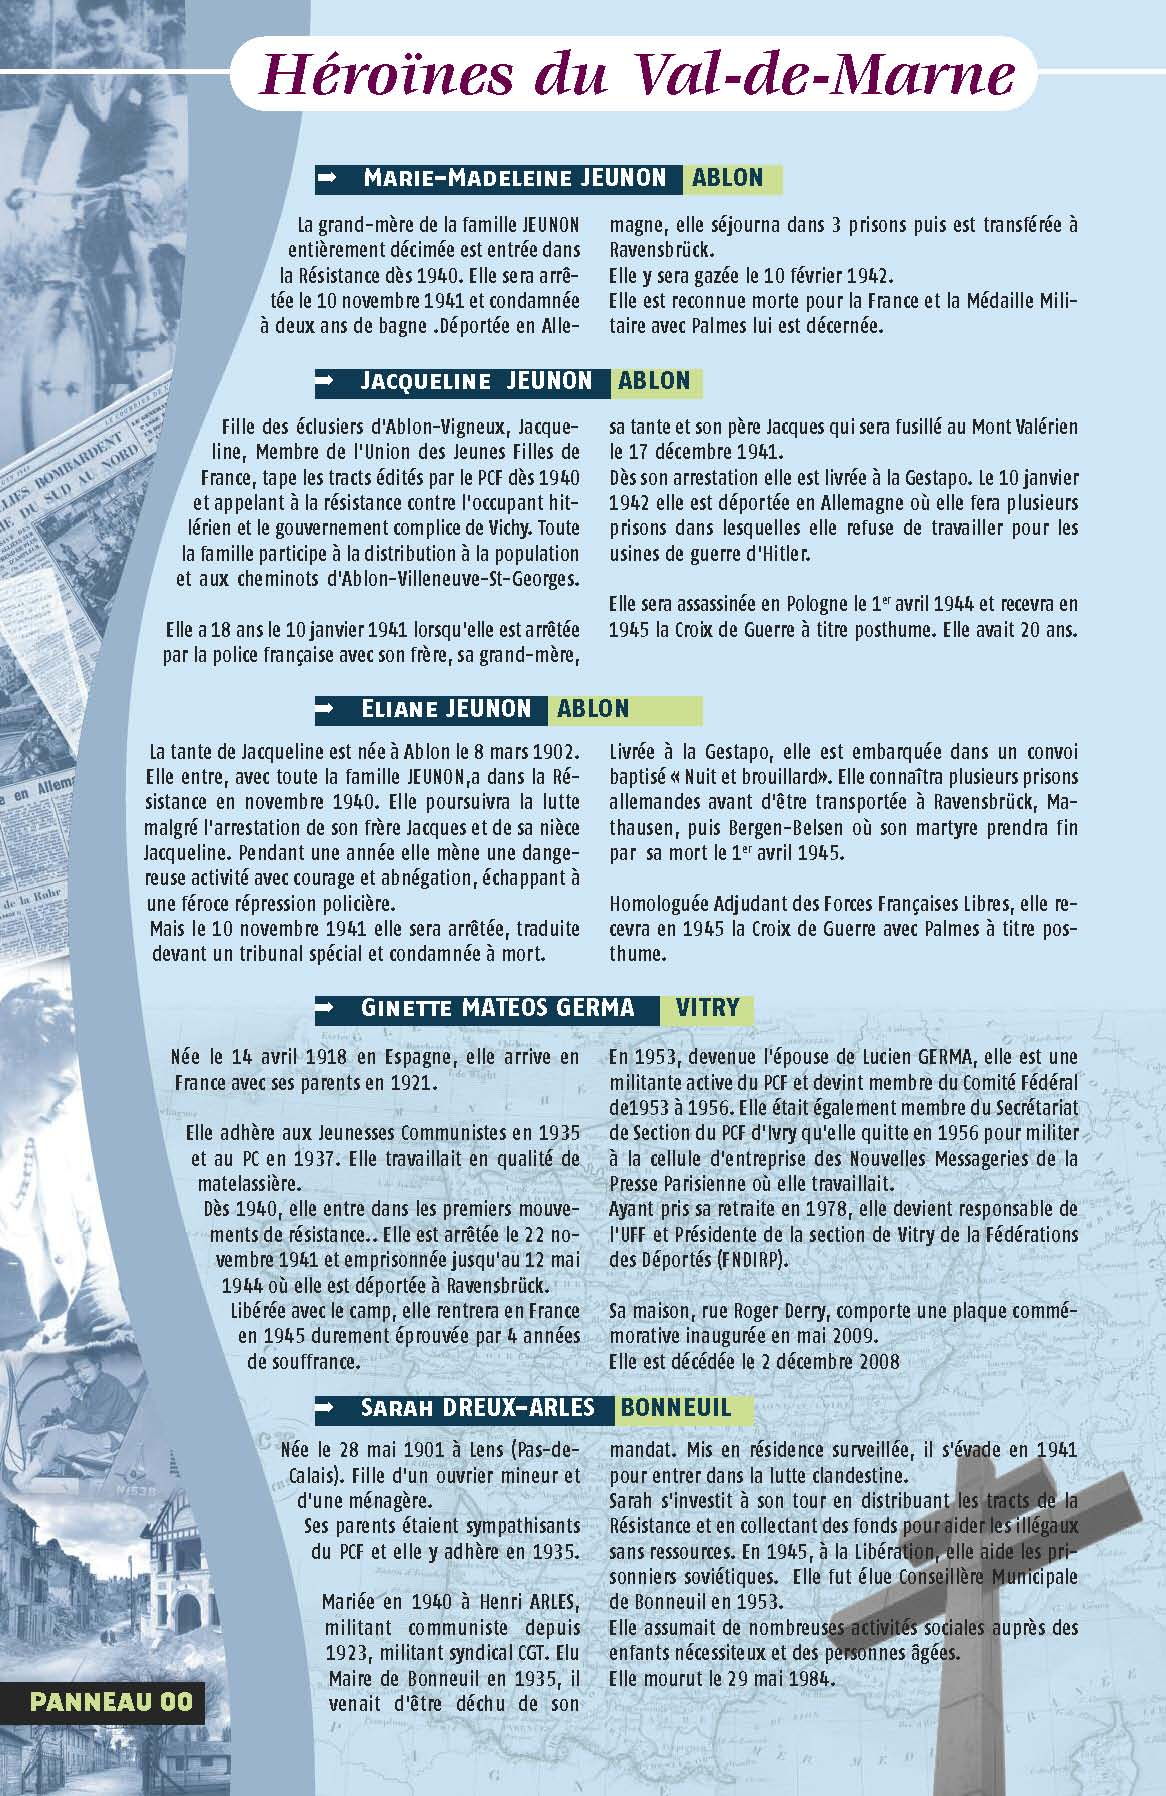 Pano8 11 page 3